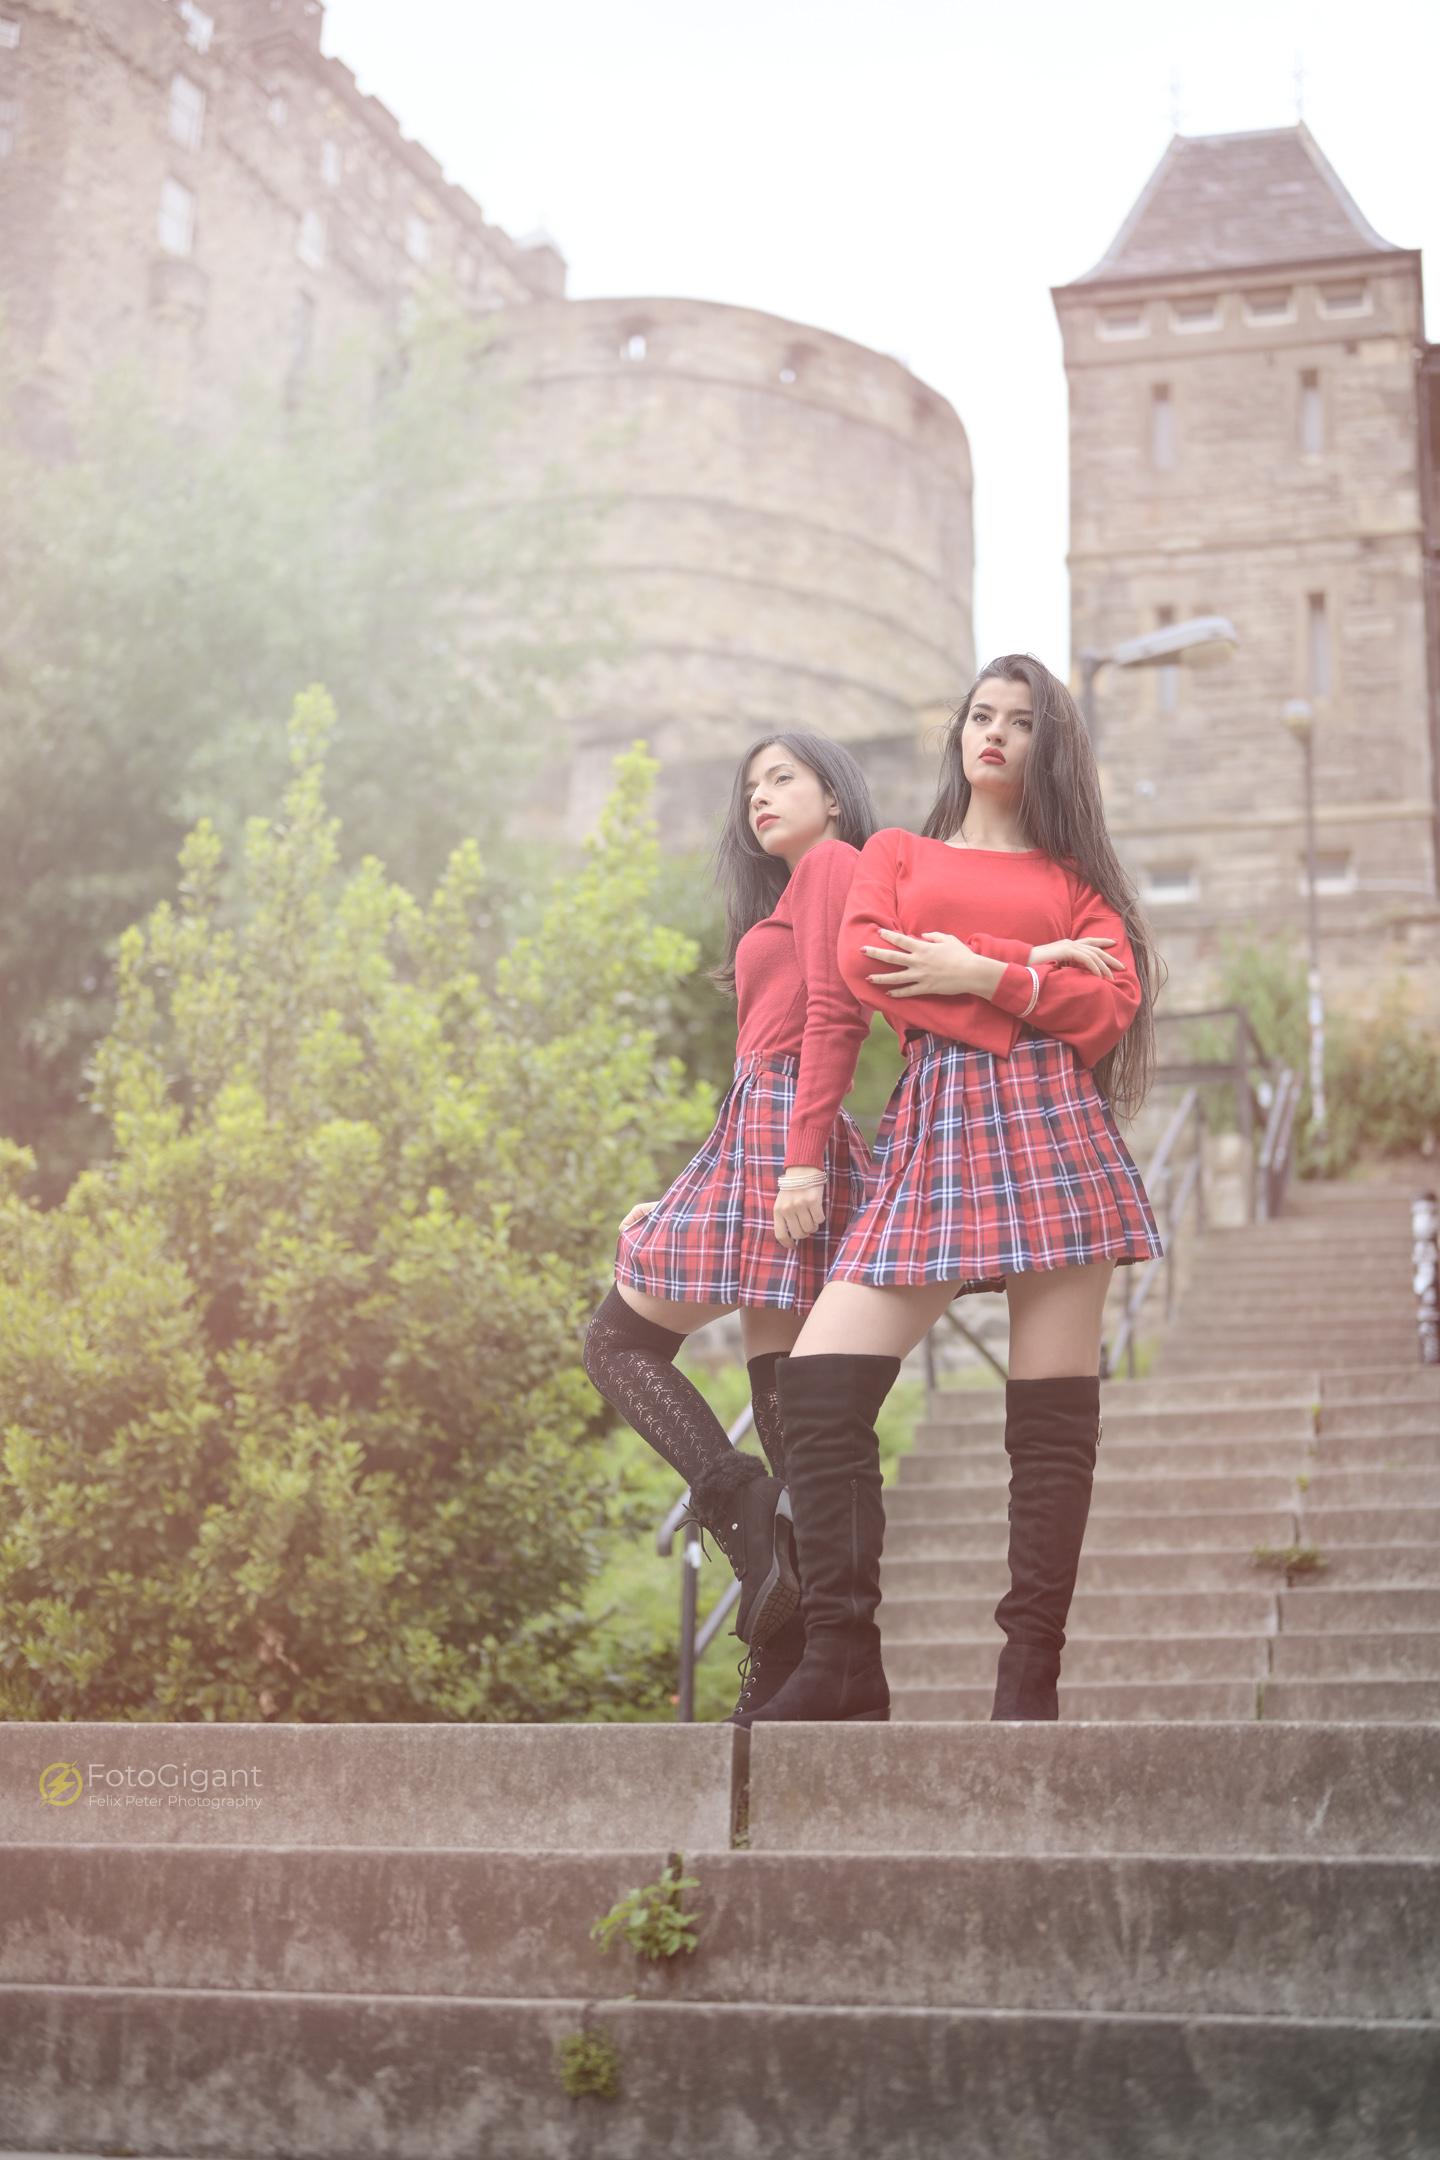 Scotland_Edinburgh_Photography-Workshop_05.jpg